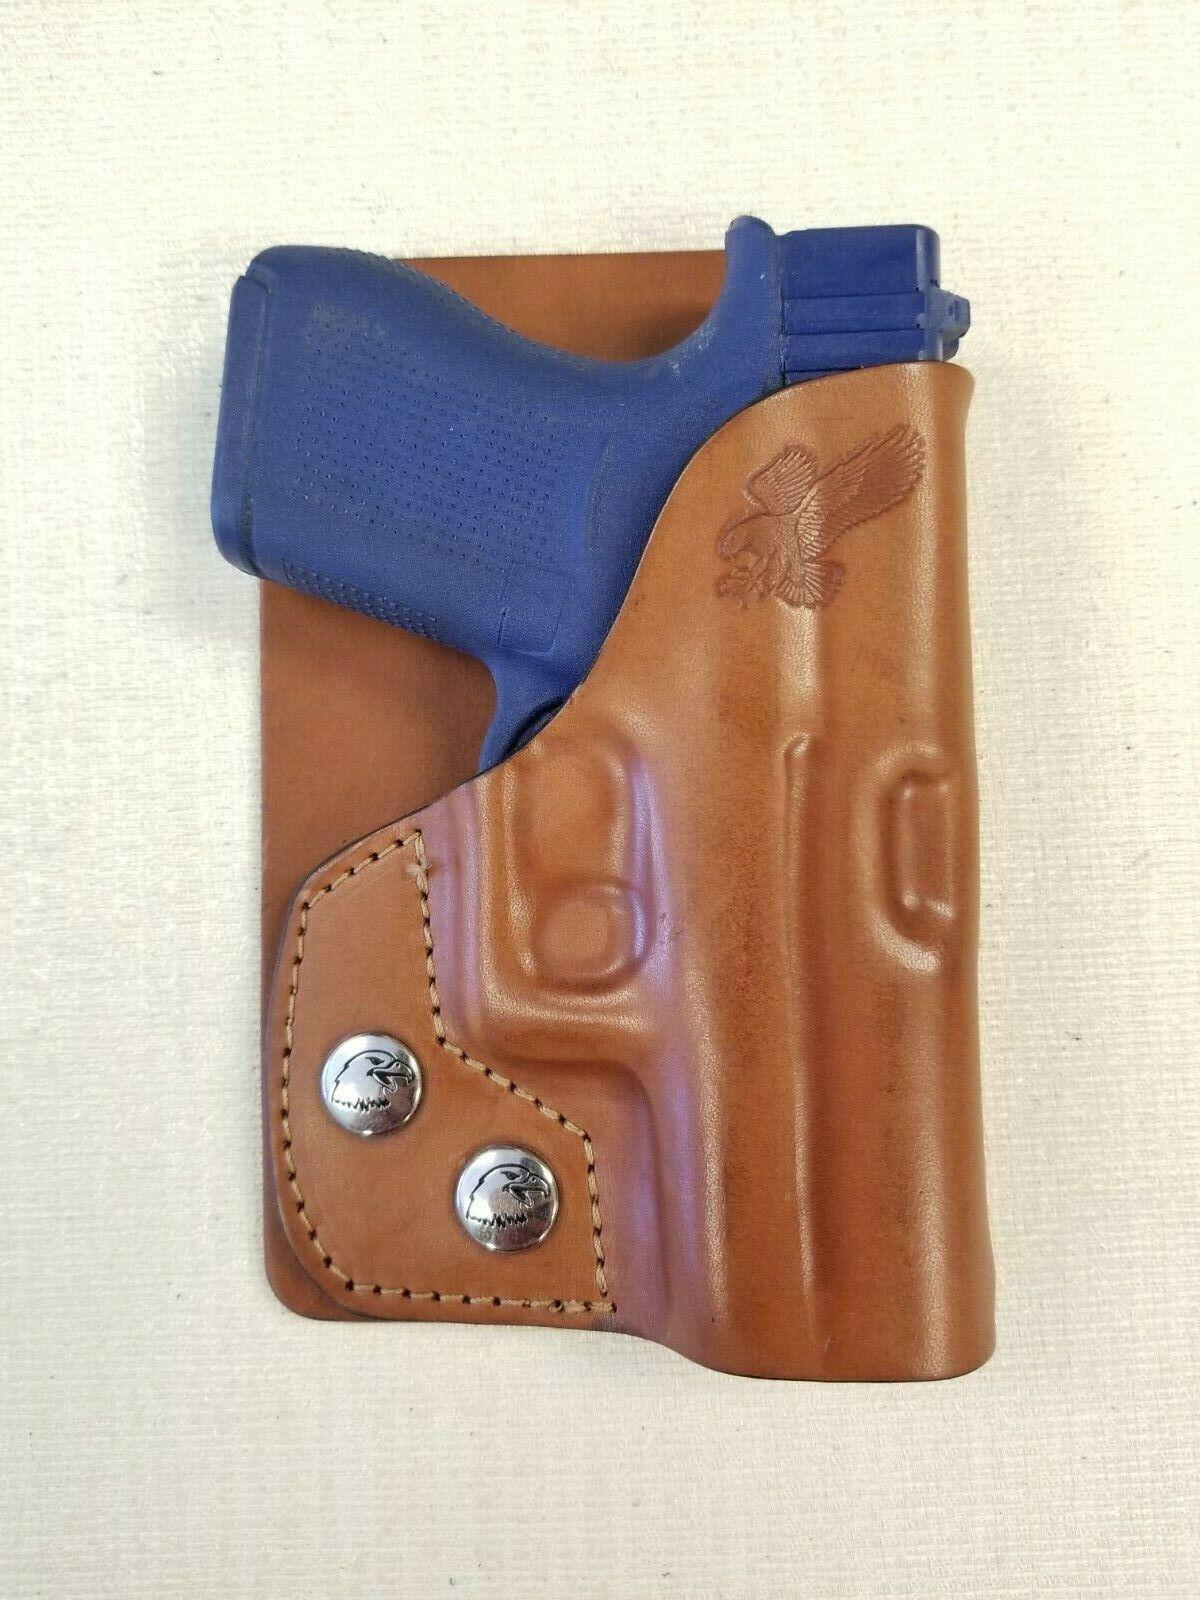 Braids Holsters LEFT HAND brown leather wallet & pocket hols